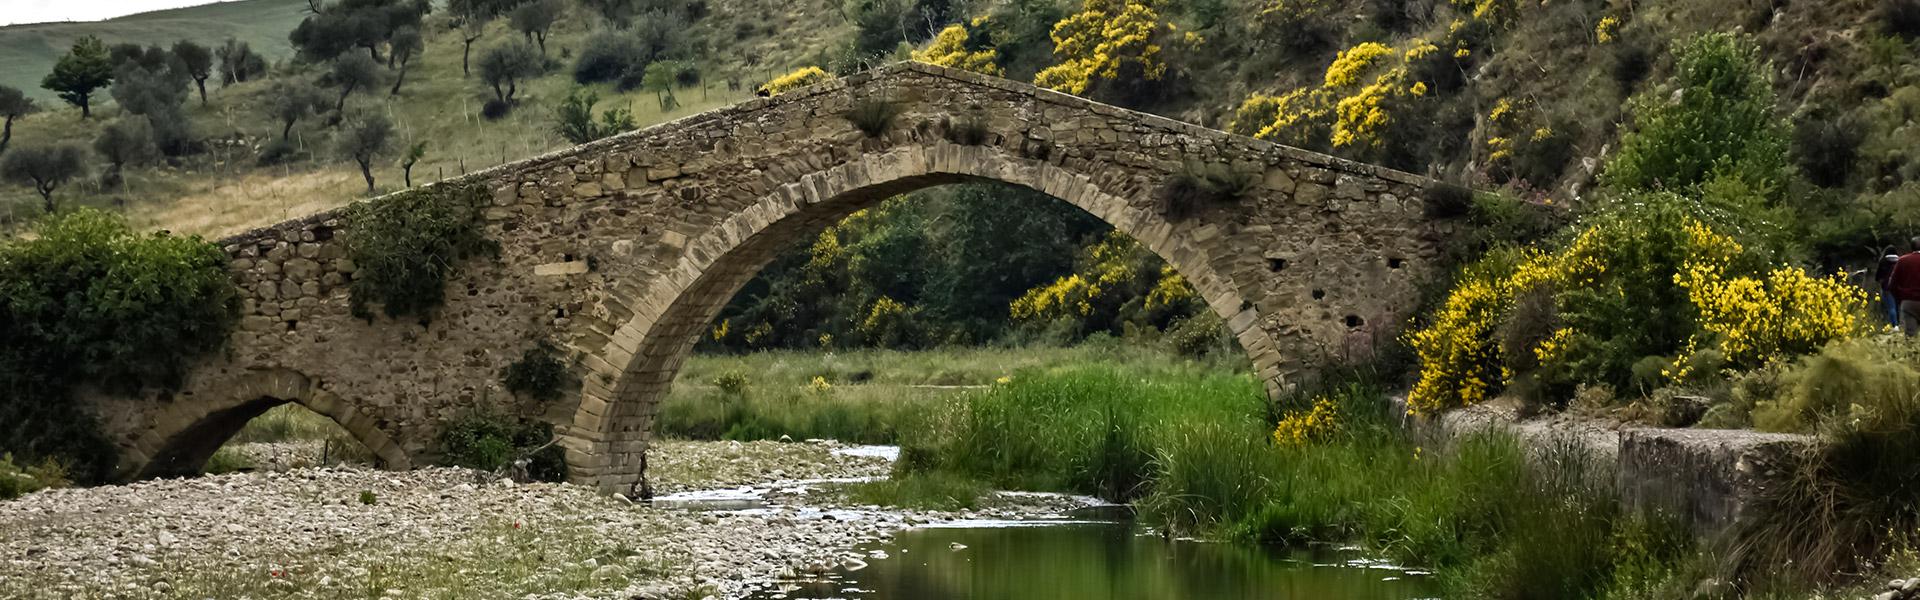 ponte-failla2